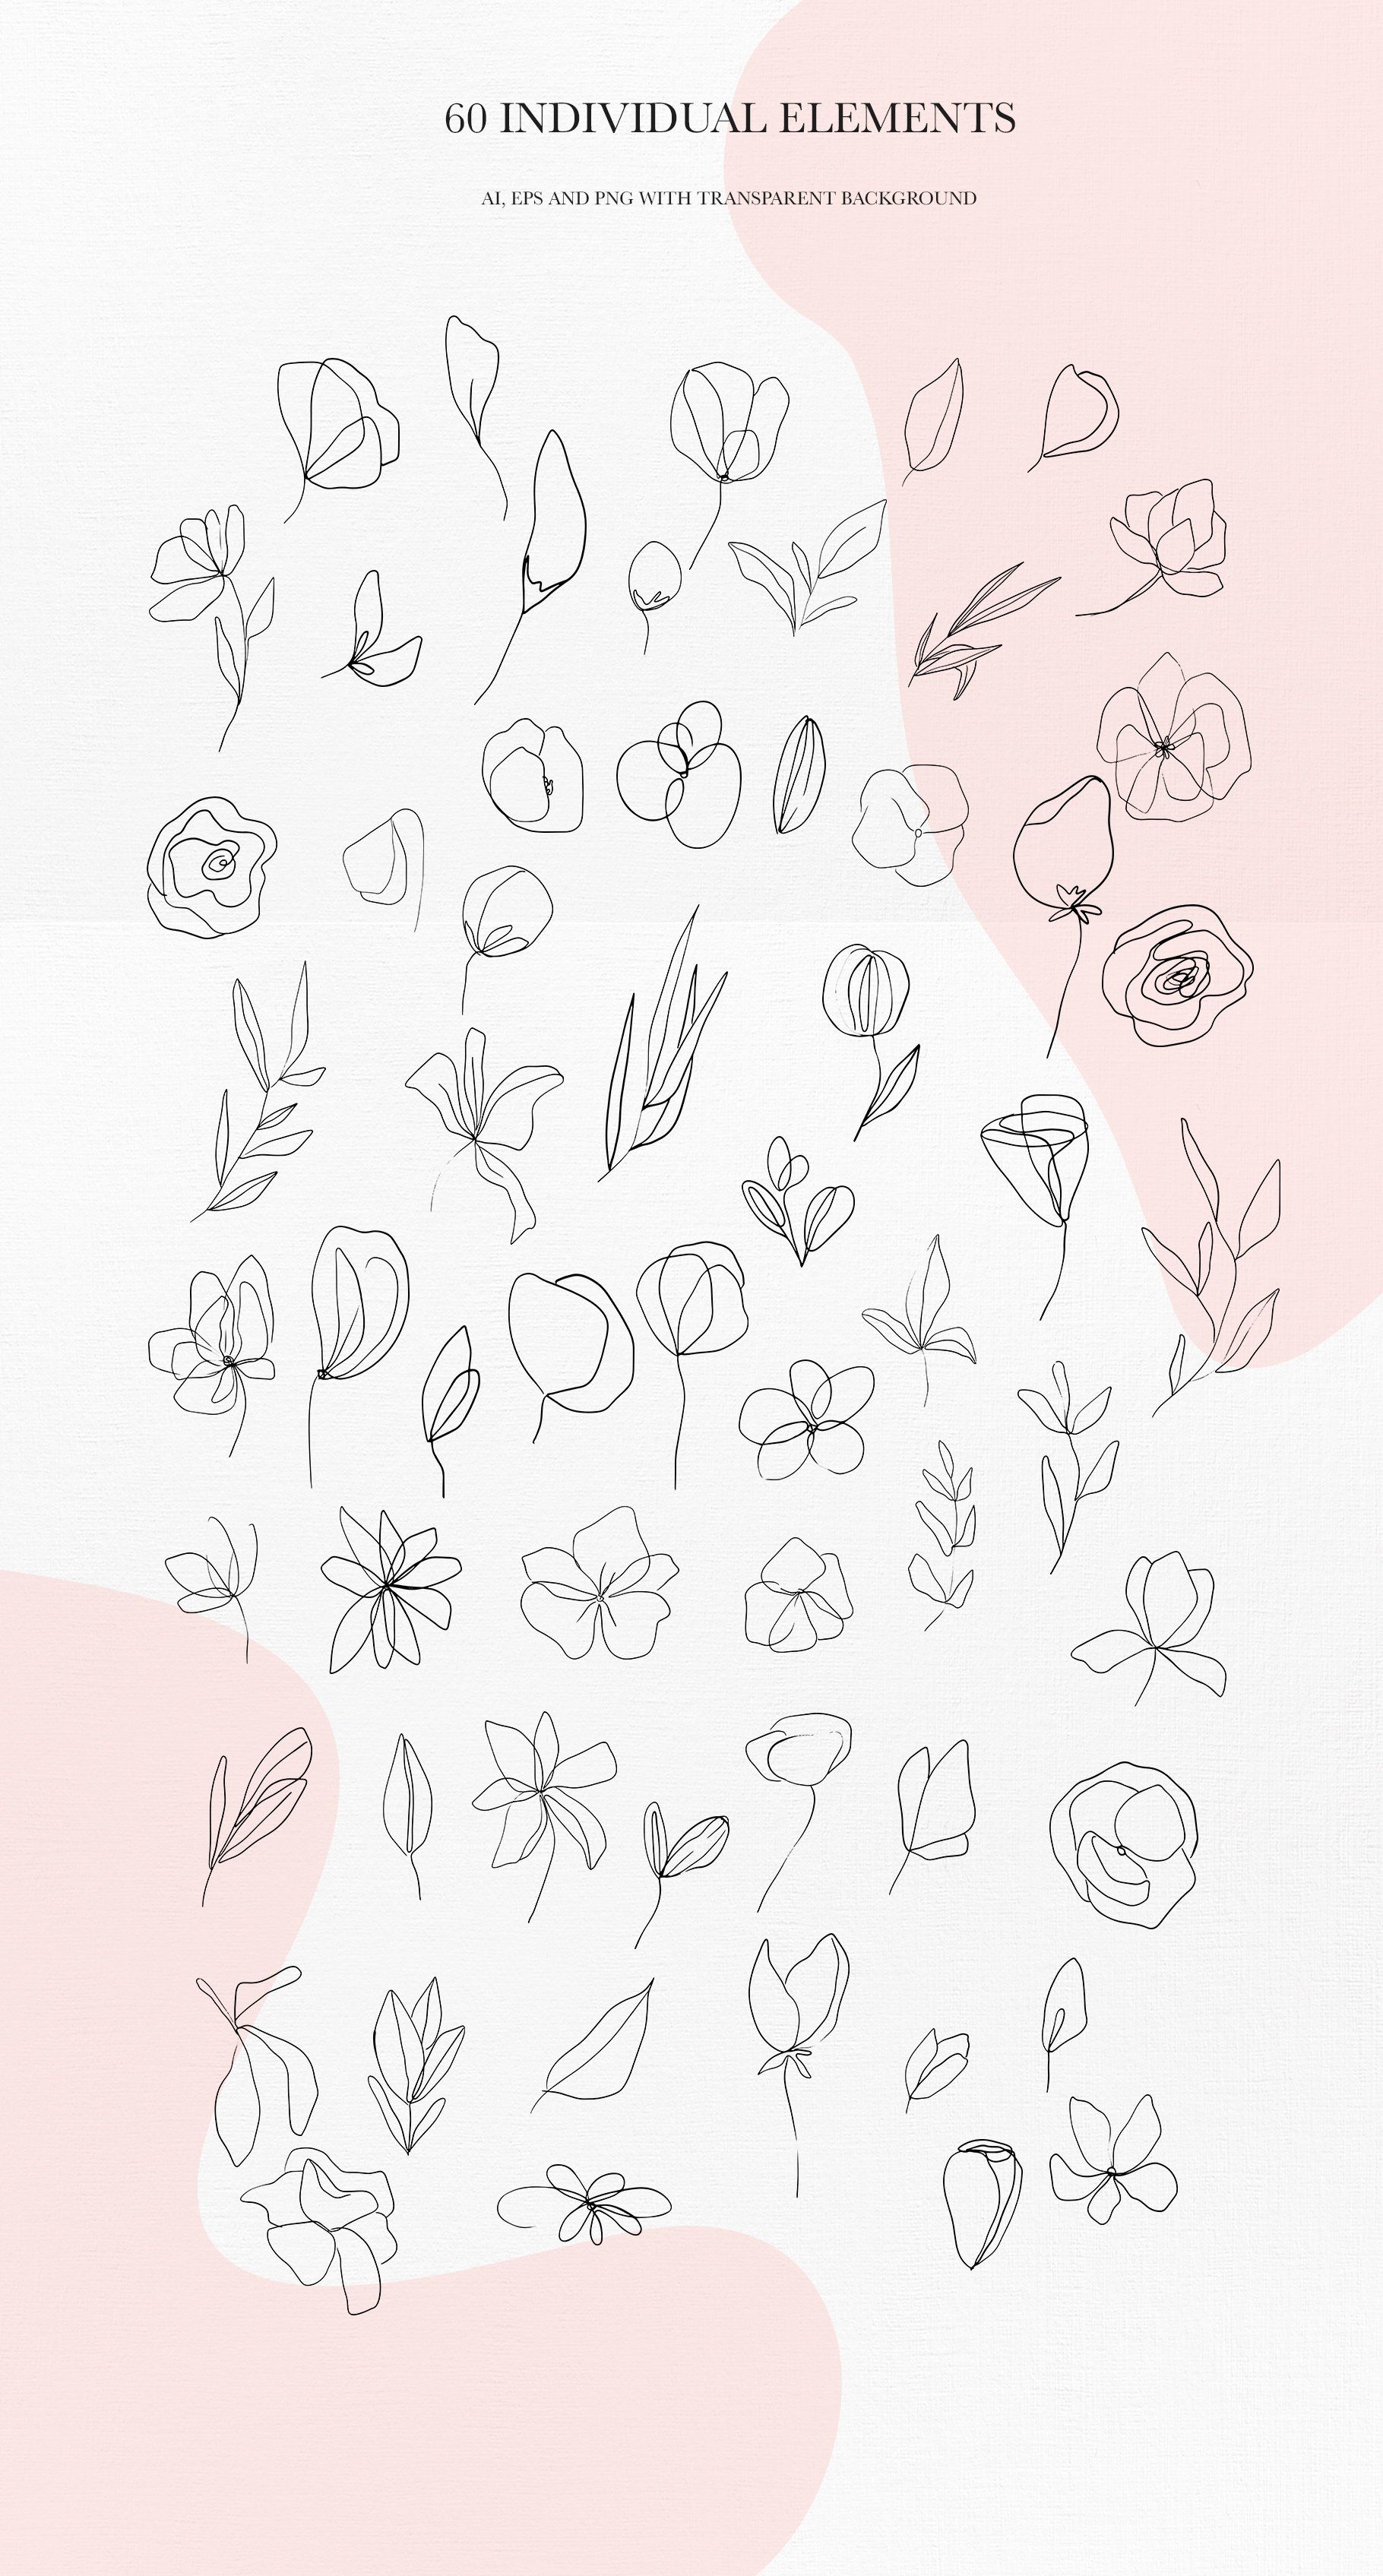 Botanical line art clipart by AnastasiiaCo on